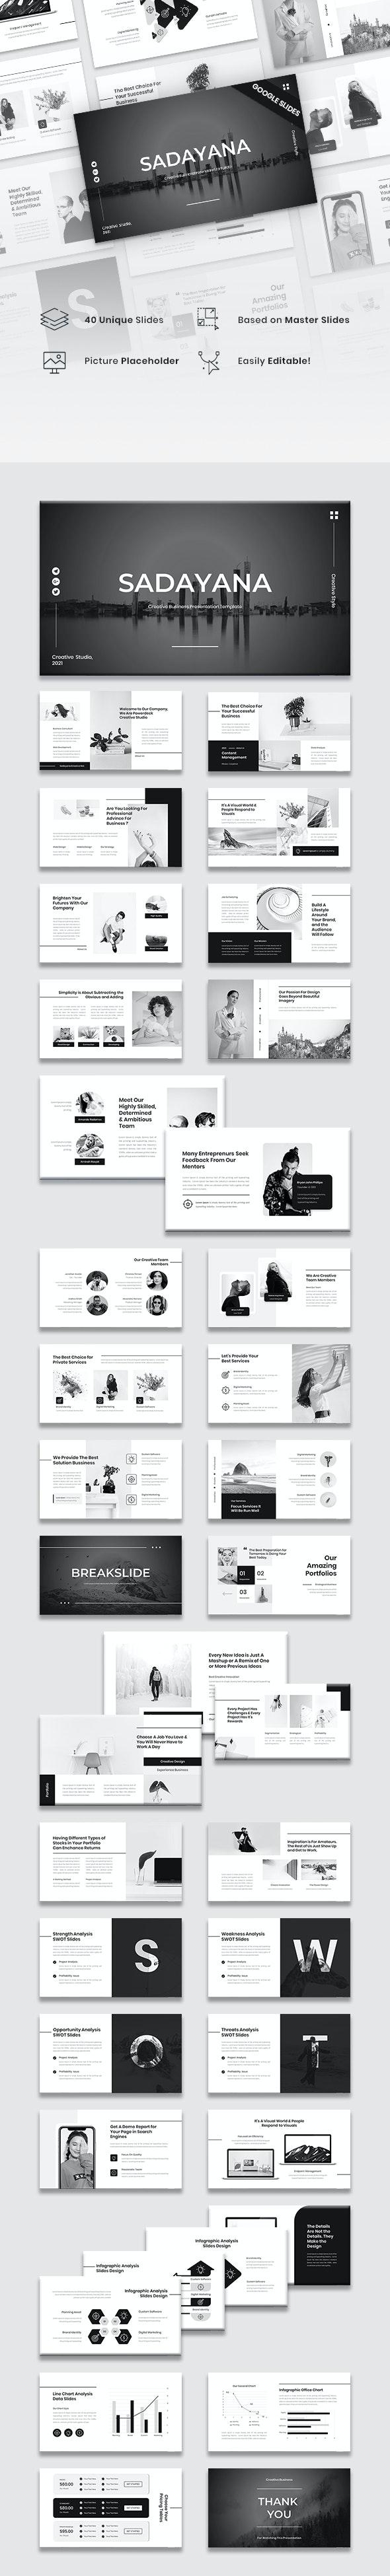 Sadayana - Creative Business Google Slides Template - Google Slides Presentation Templates